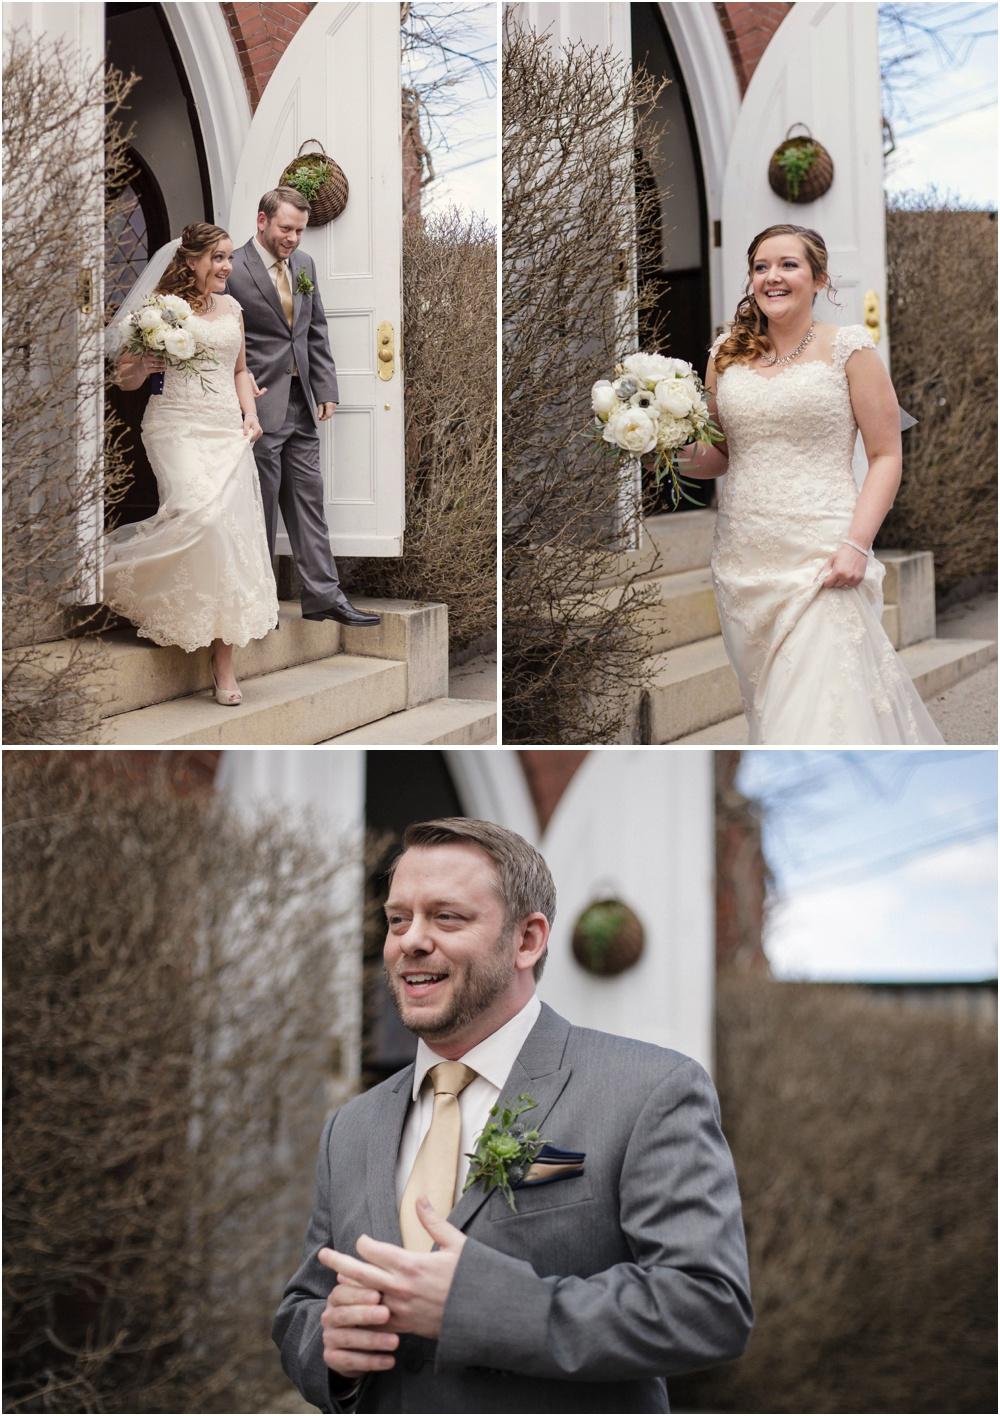 RI-Wedding-Photographer-Lefebvre-Photo-Blog_1643.jpg